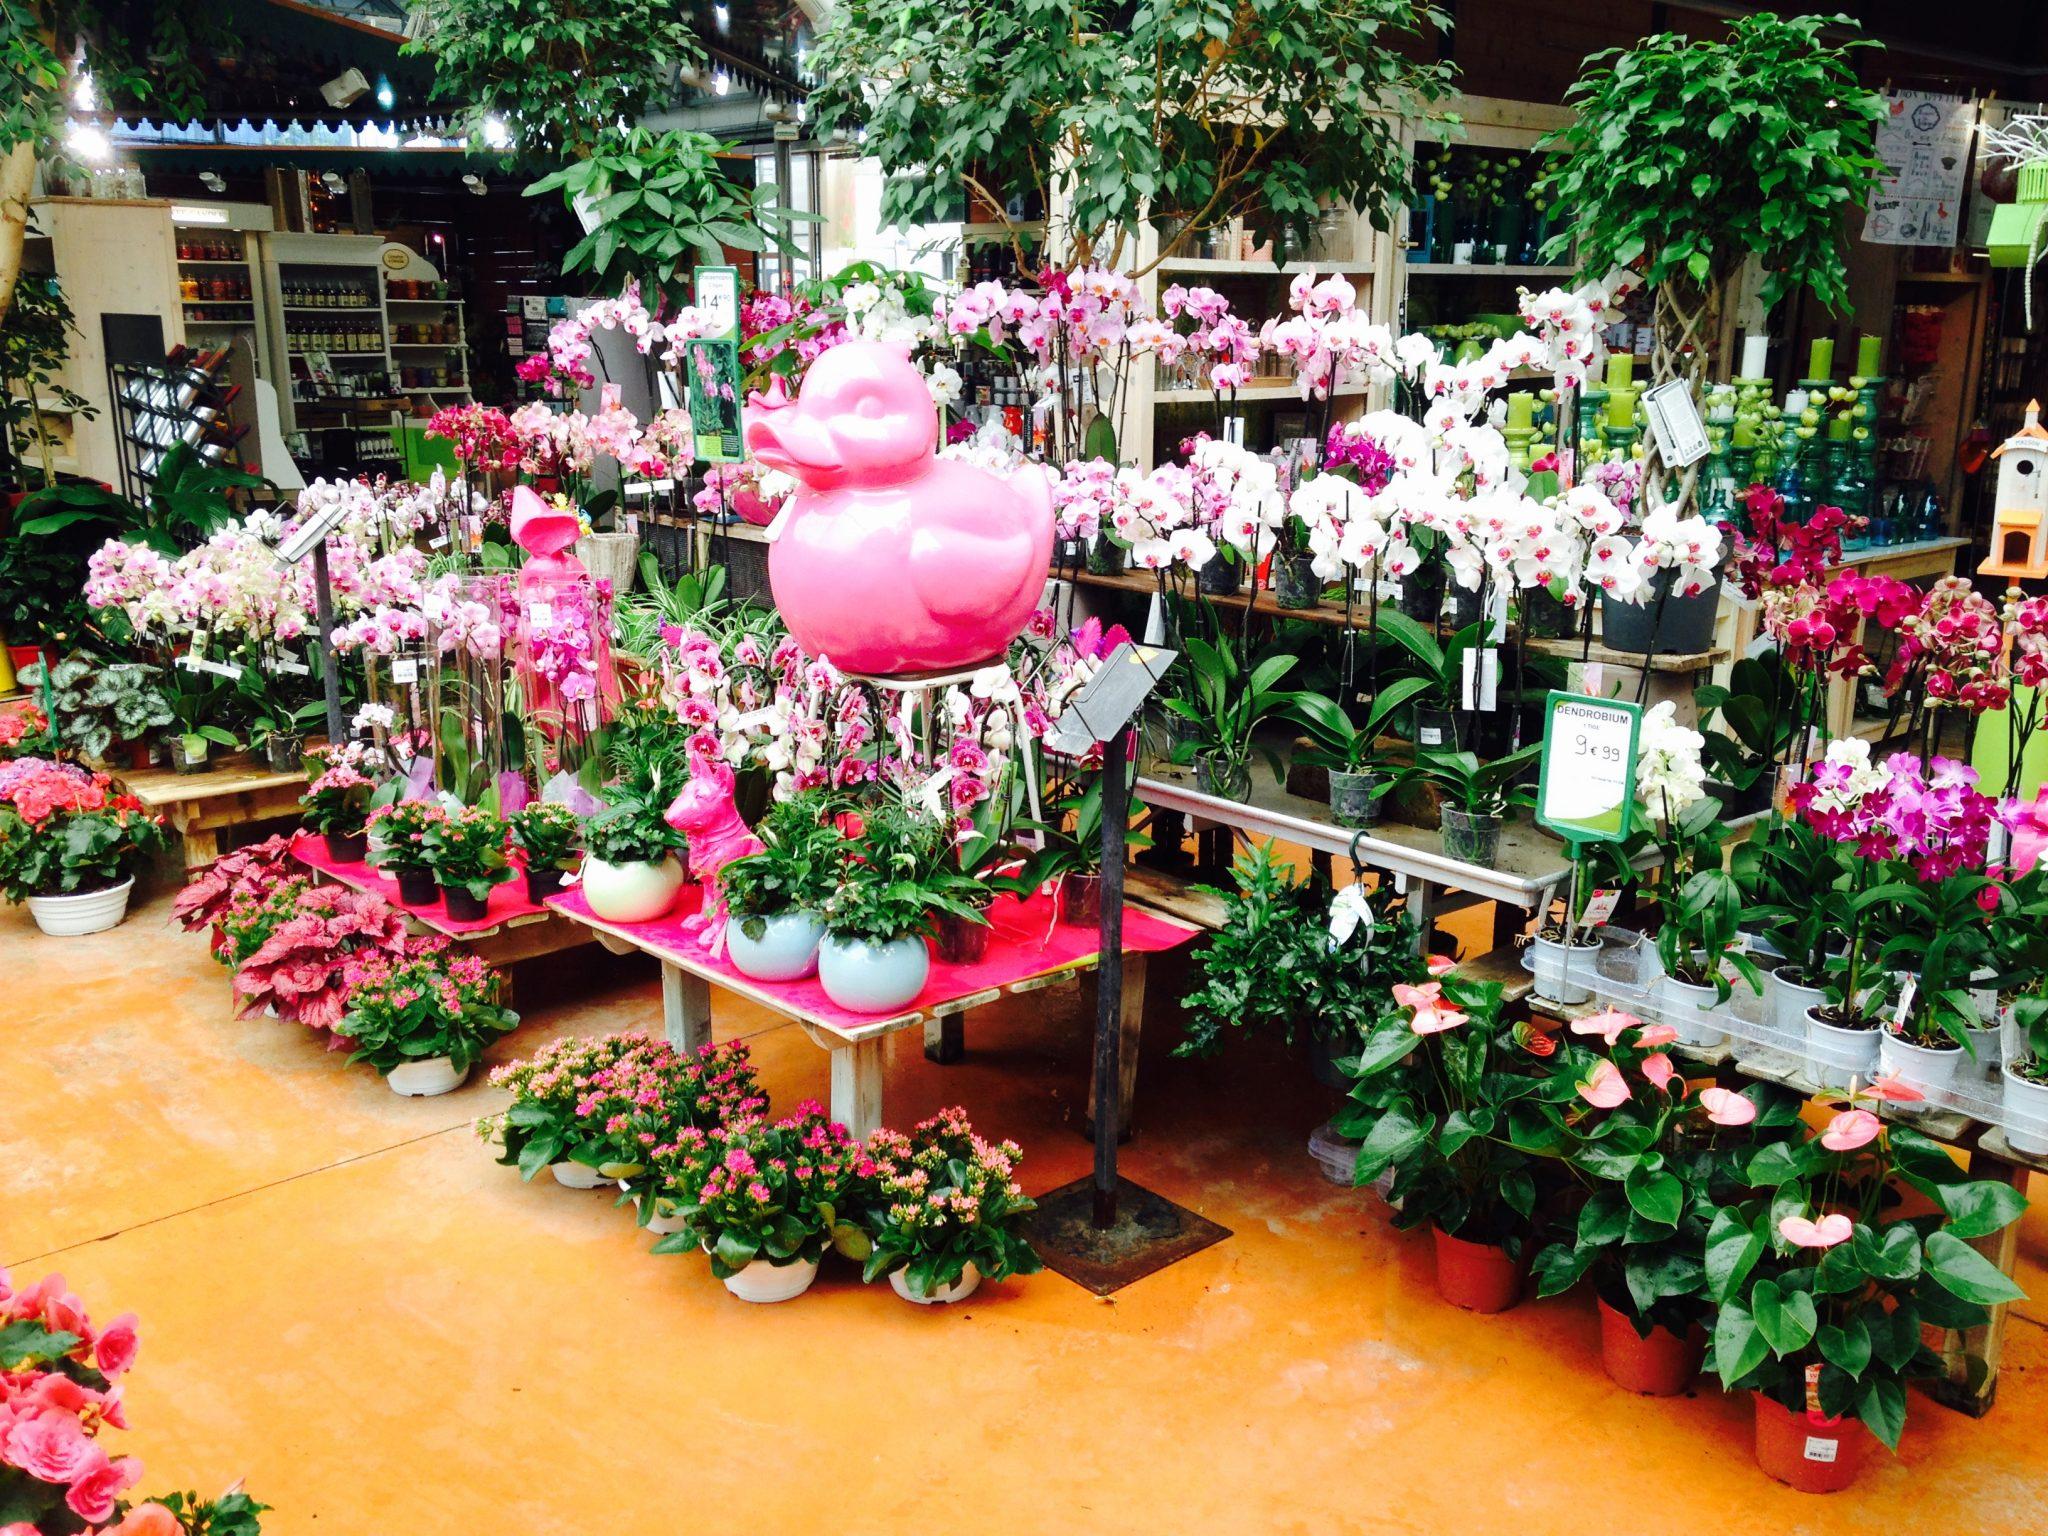 entretien des plantes vertes l 39 atelier des fleurs. Black Bedroom Furniture Sets. Home Design Ideas